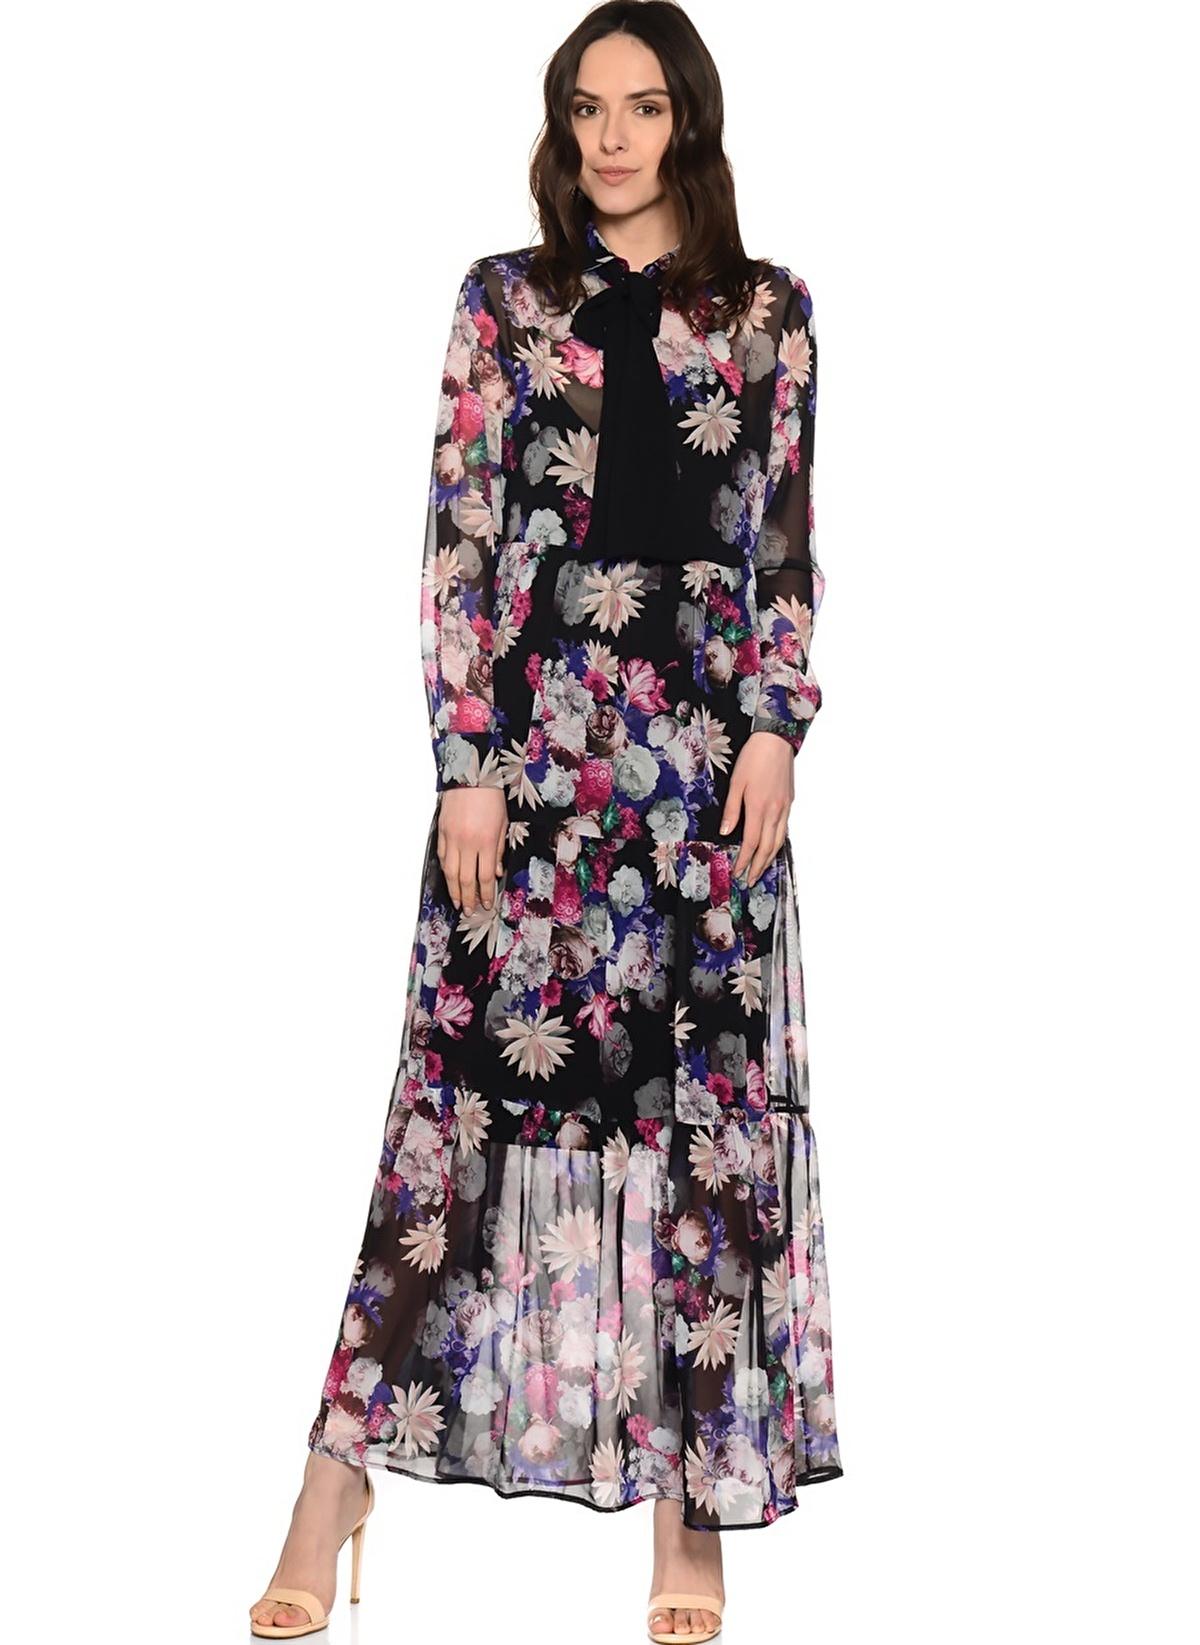 House Of Camellia Elbise 71jan Hoc078 Hc Elbise Prınt – 99.99 TL